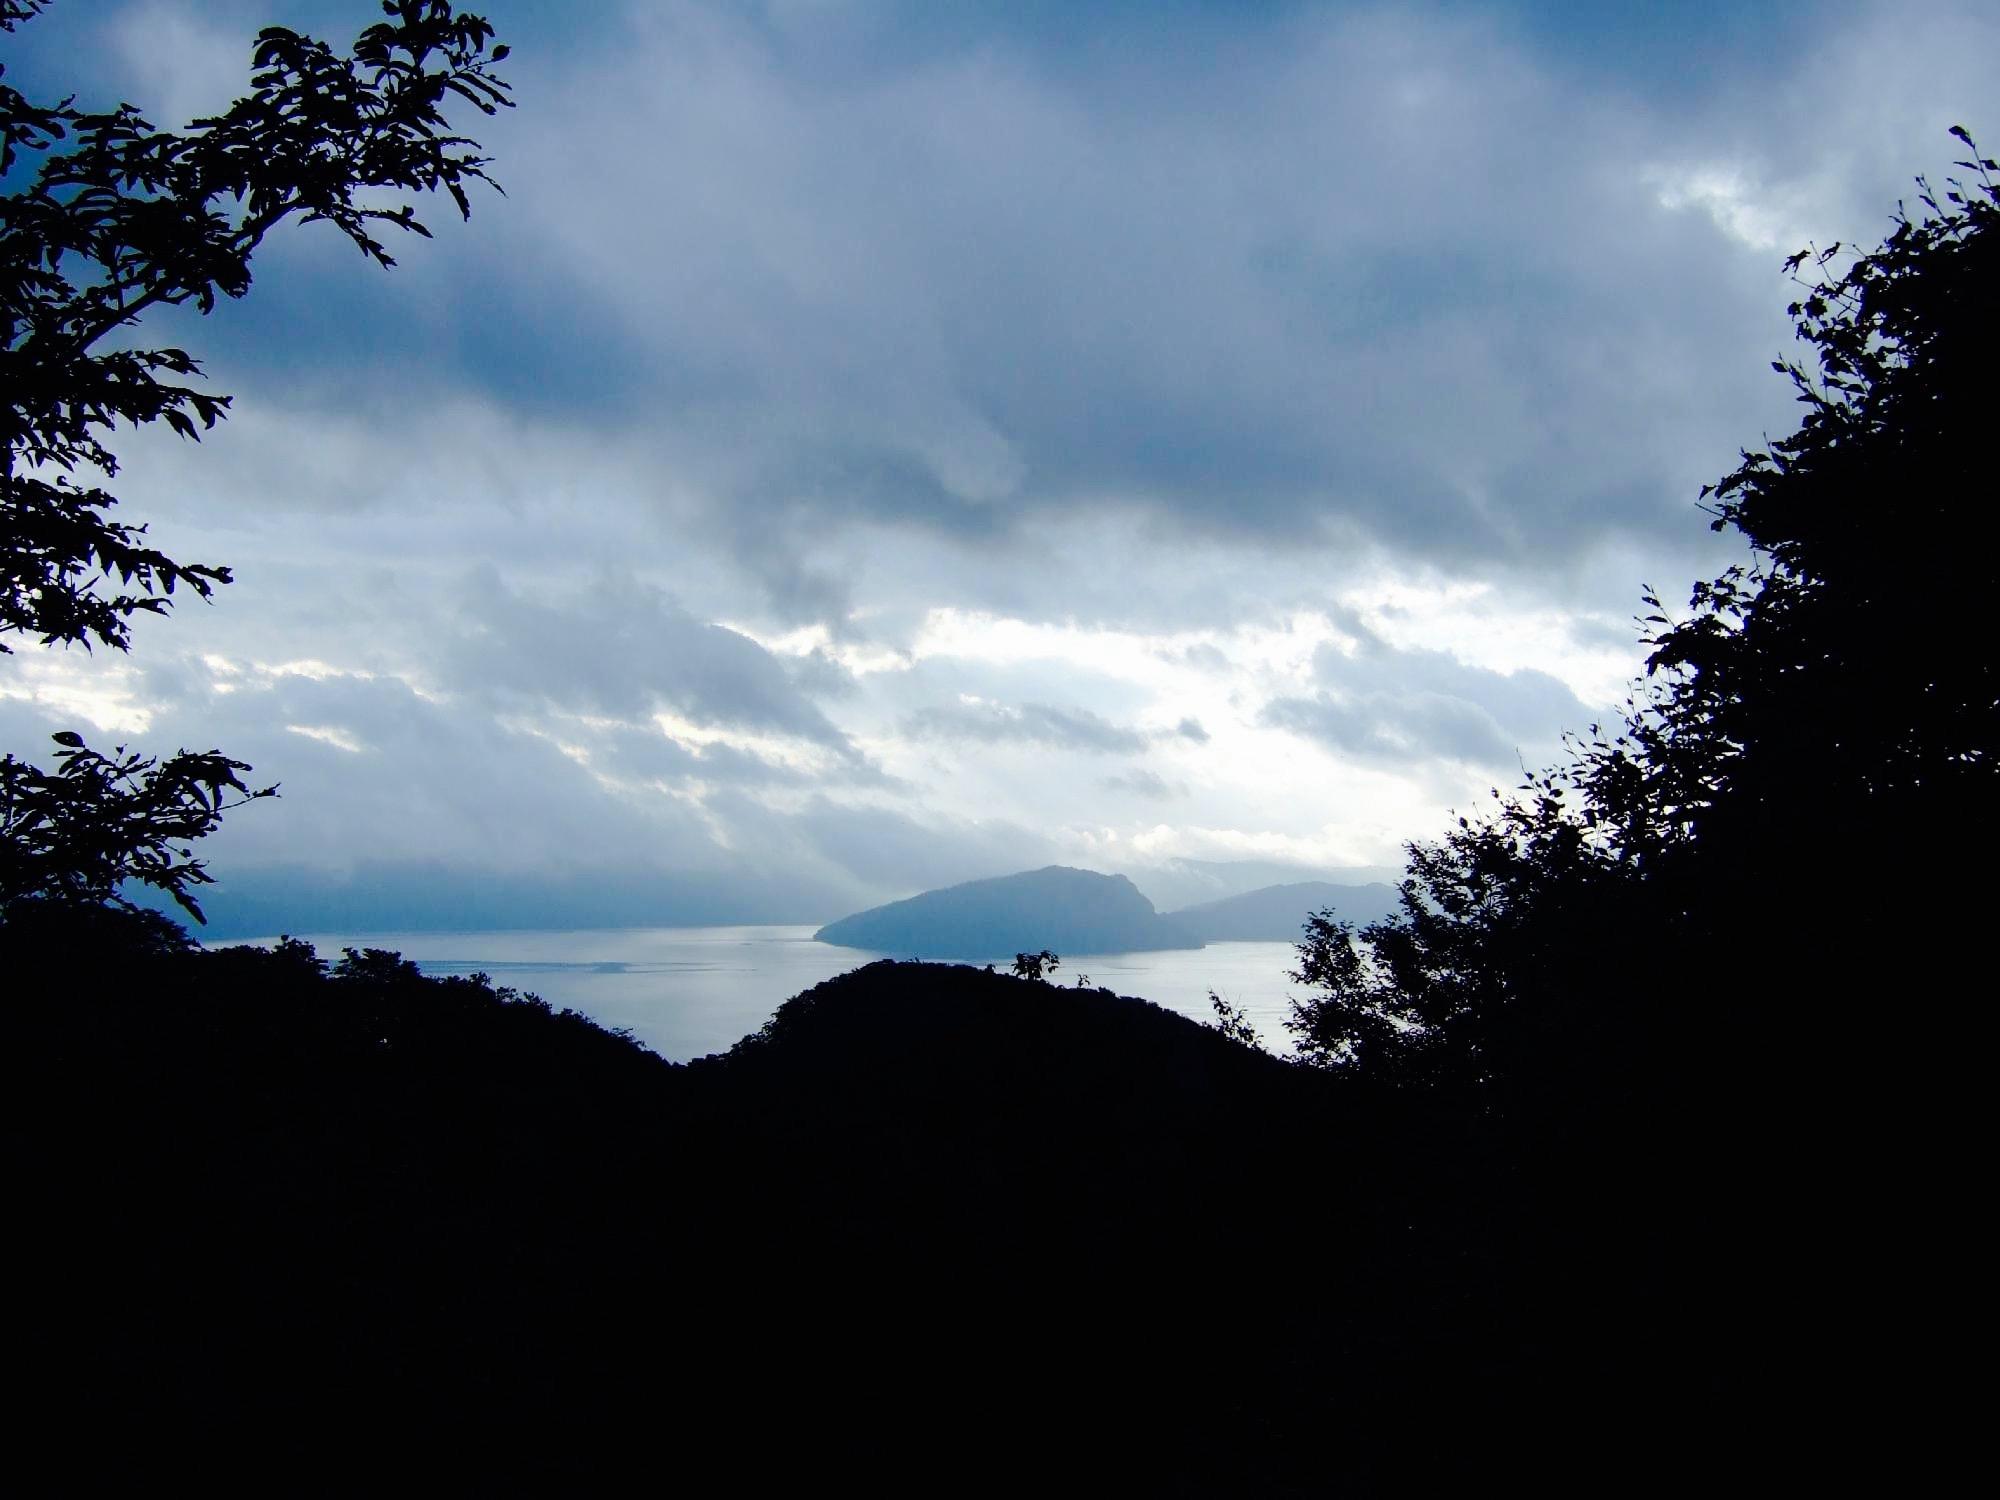 Takinozawa Observatory